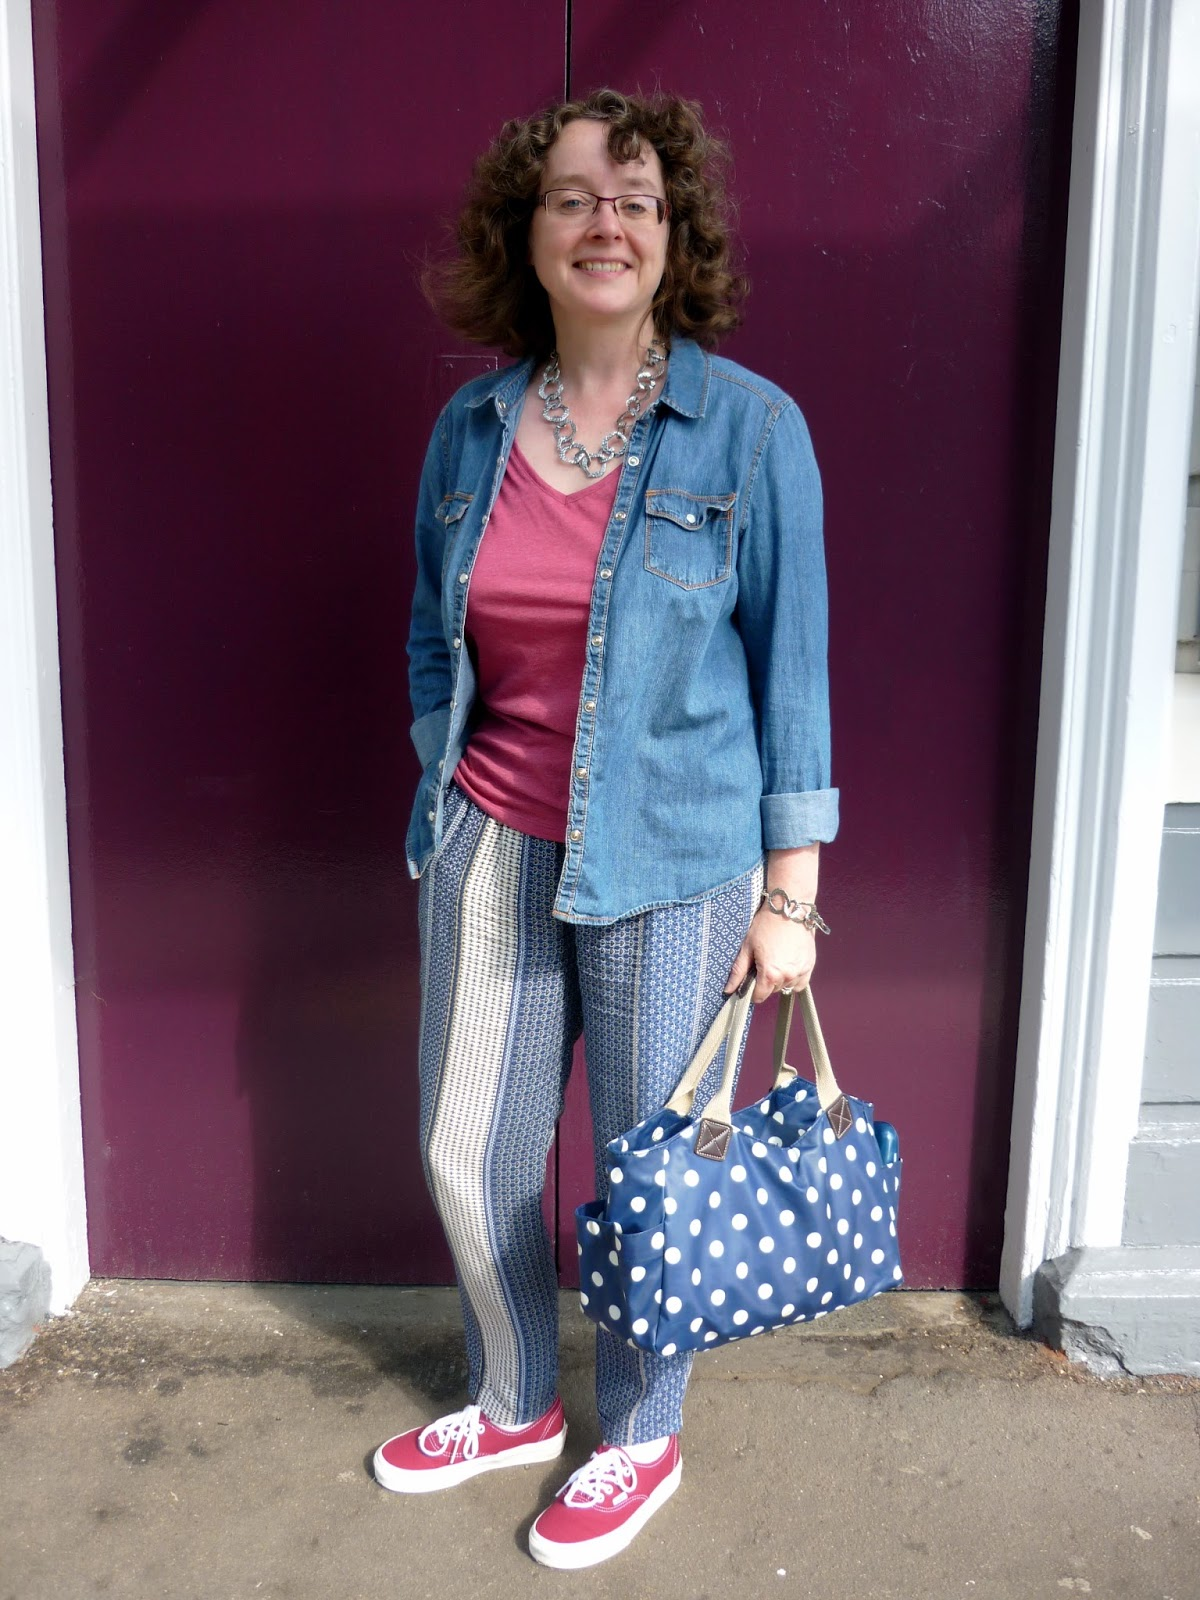 Printed Trousers, Vans, Spot Bag | PetiteSilverVixen